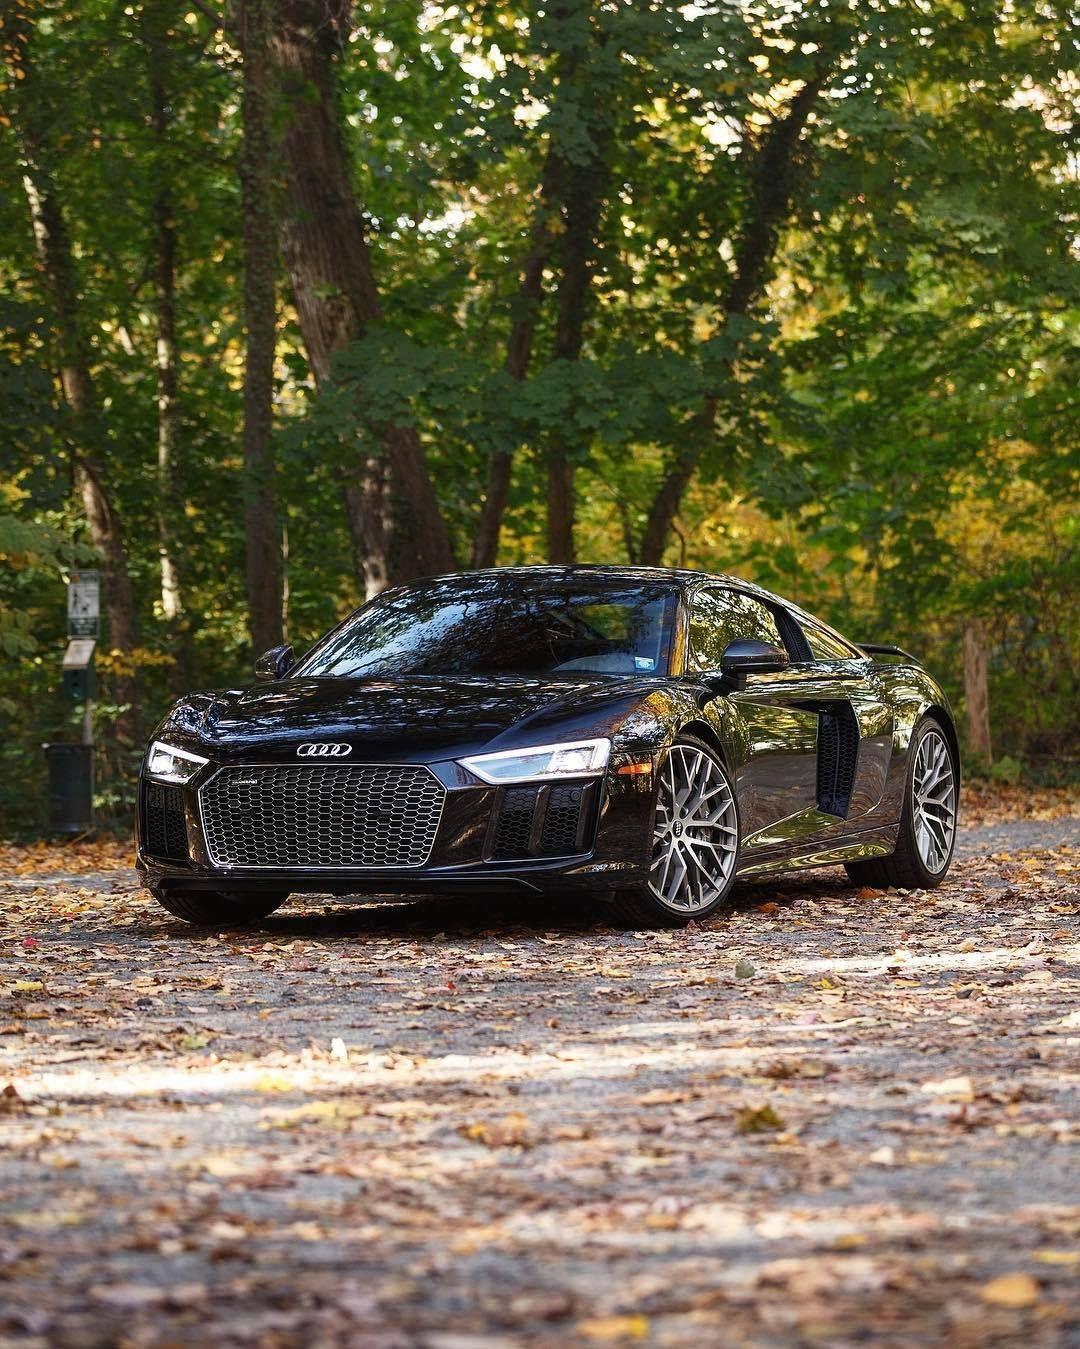 Audi Sport Performance Parts R8 V10 Plus Is Strictly: 2016 Audi R8 V10 Plus In Mythos Black Metallic